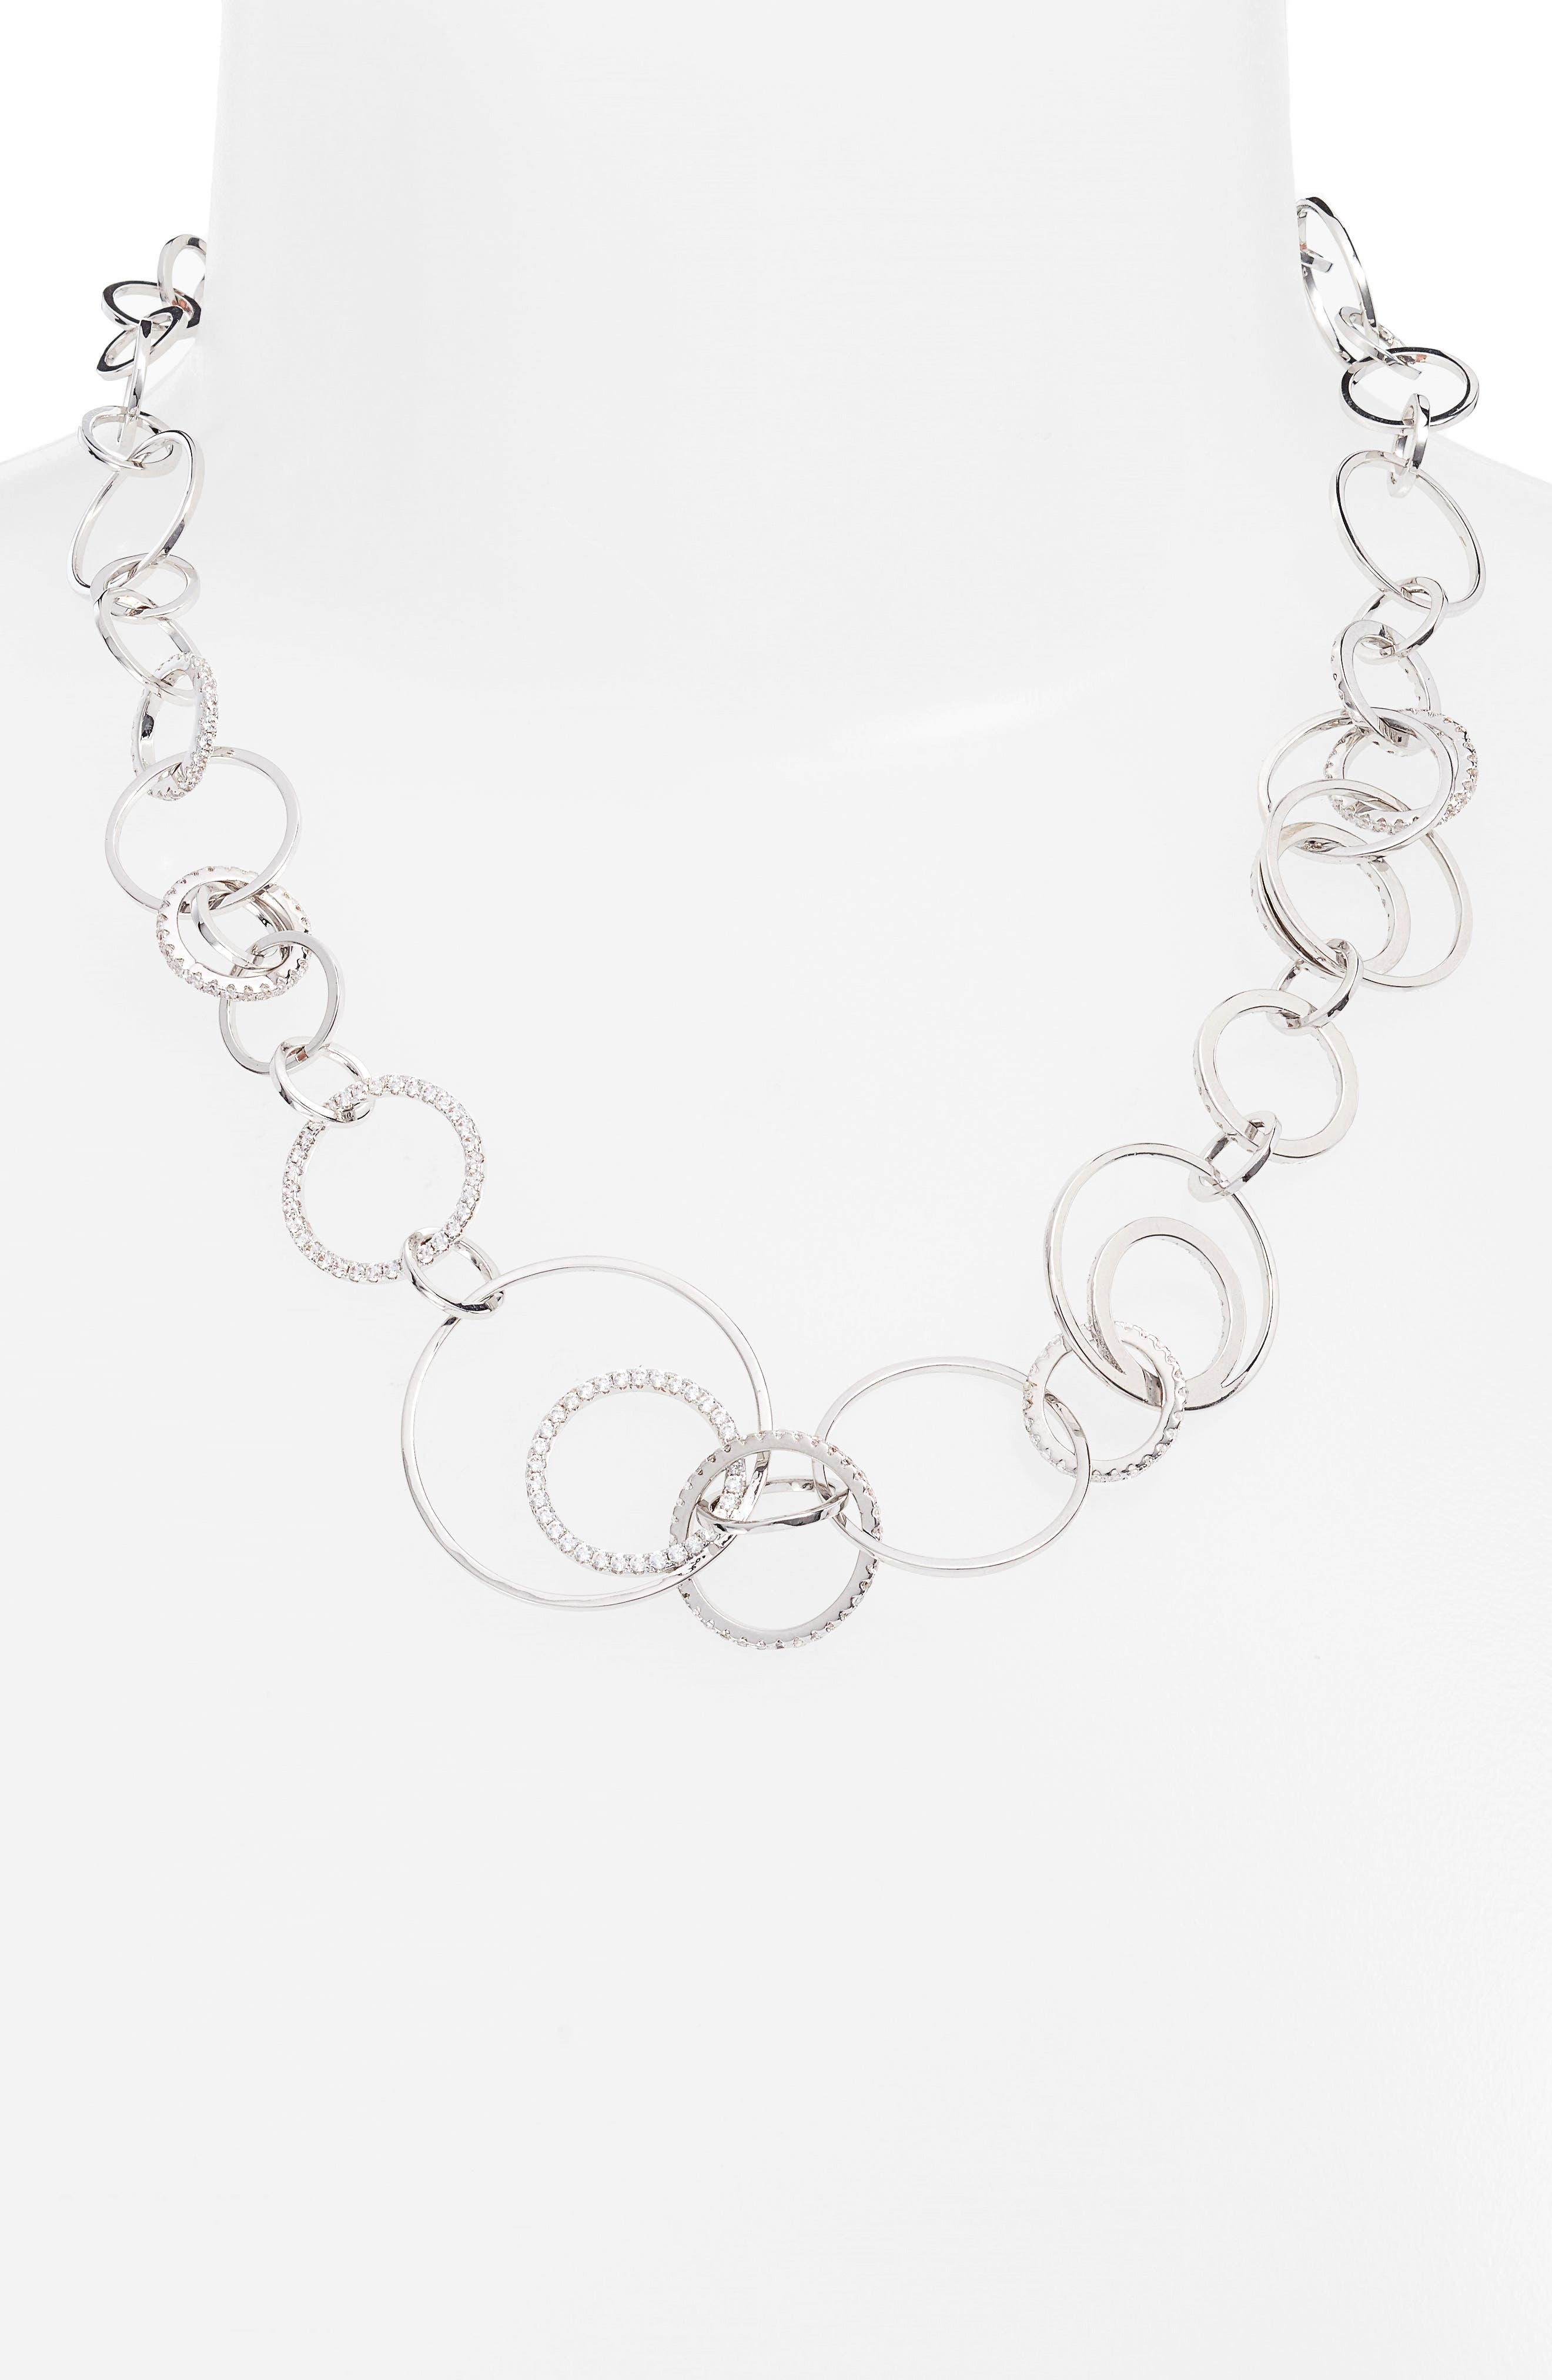 Sarah Cubic Zirconia Collar Necklace,                             Alternate thumbnail 2, color,                             041